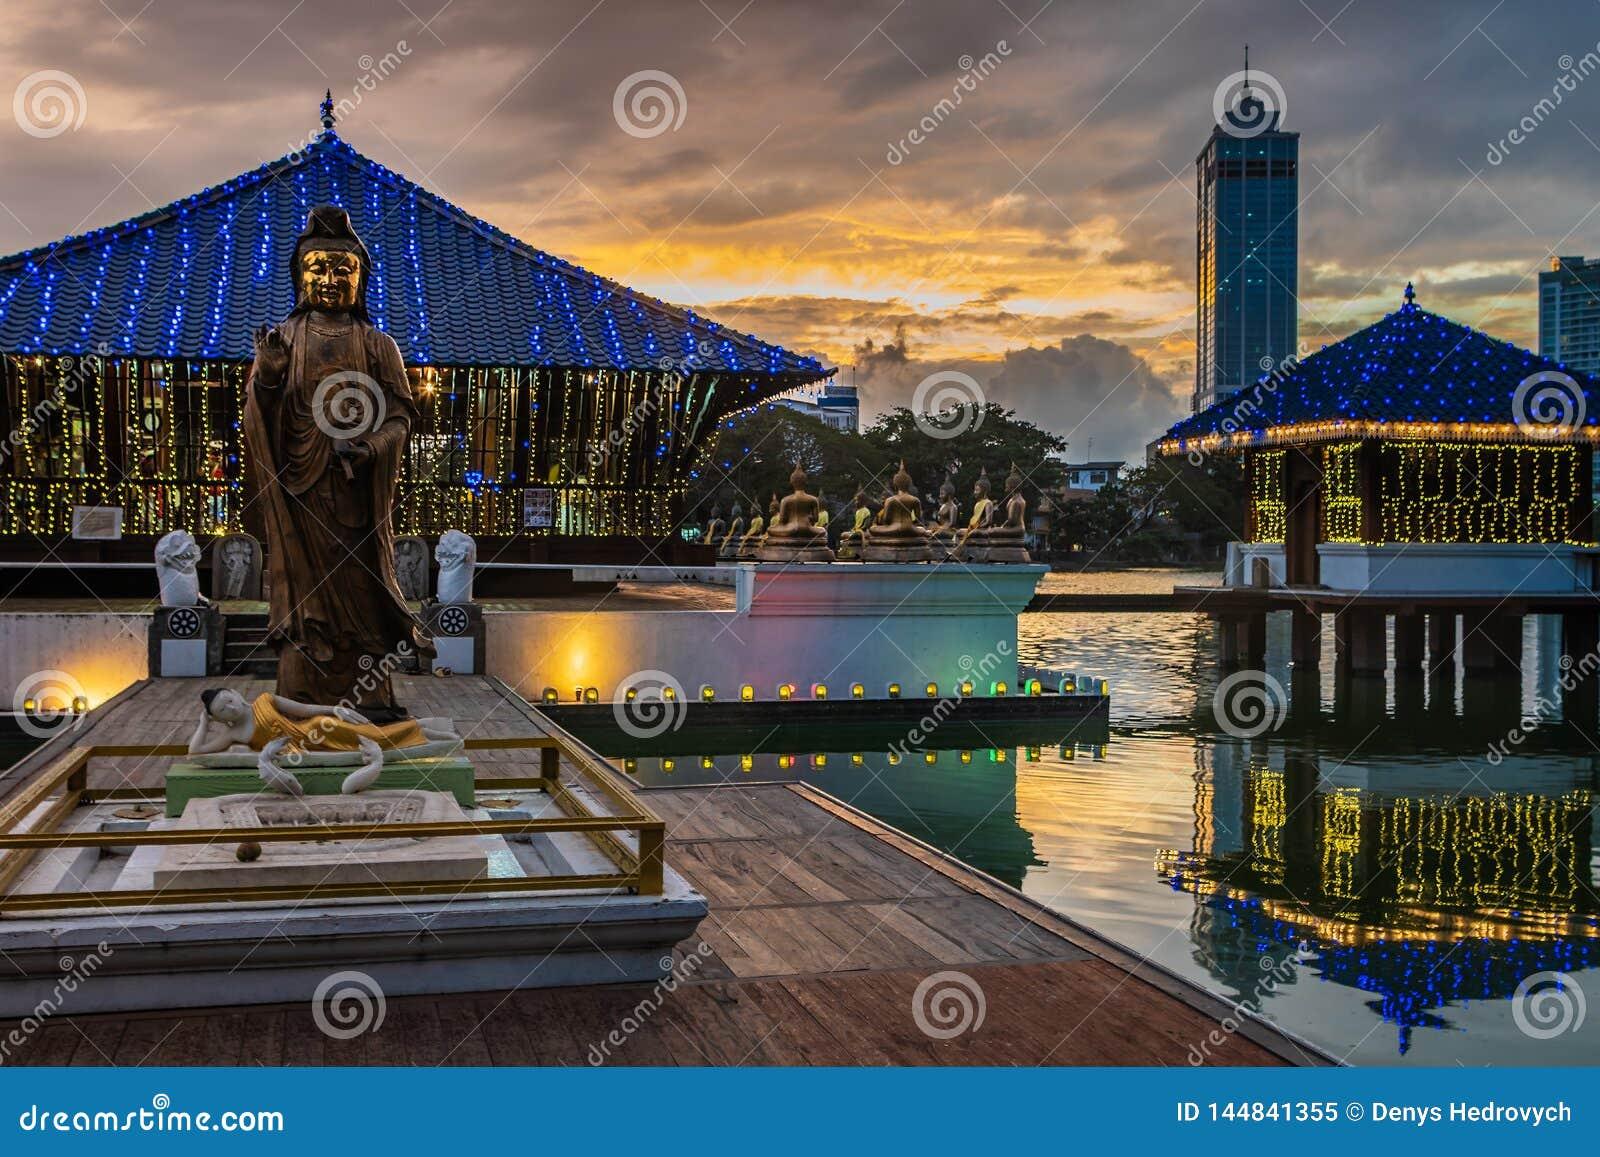 Templo budista em Colombo, Sri Lanka no por do sol